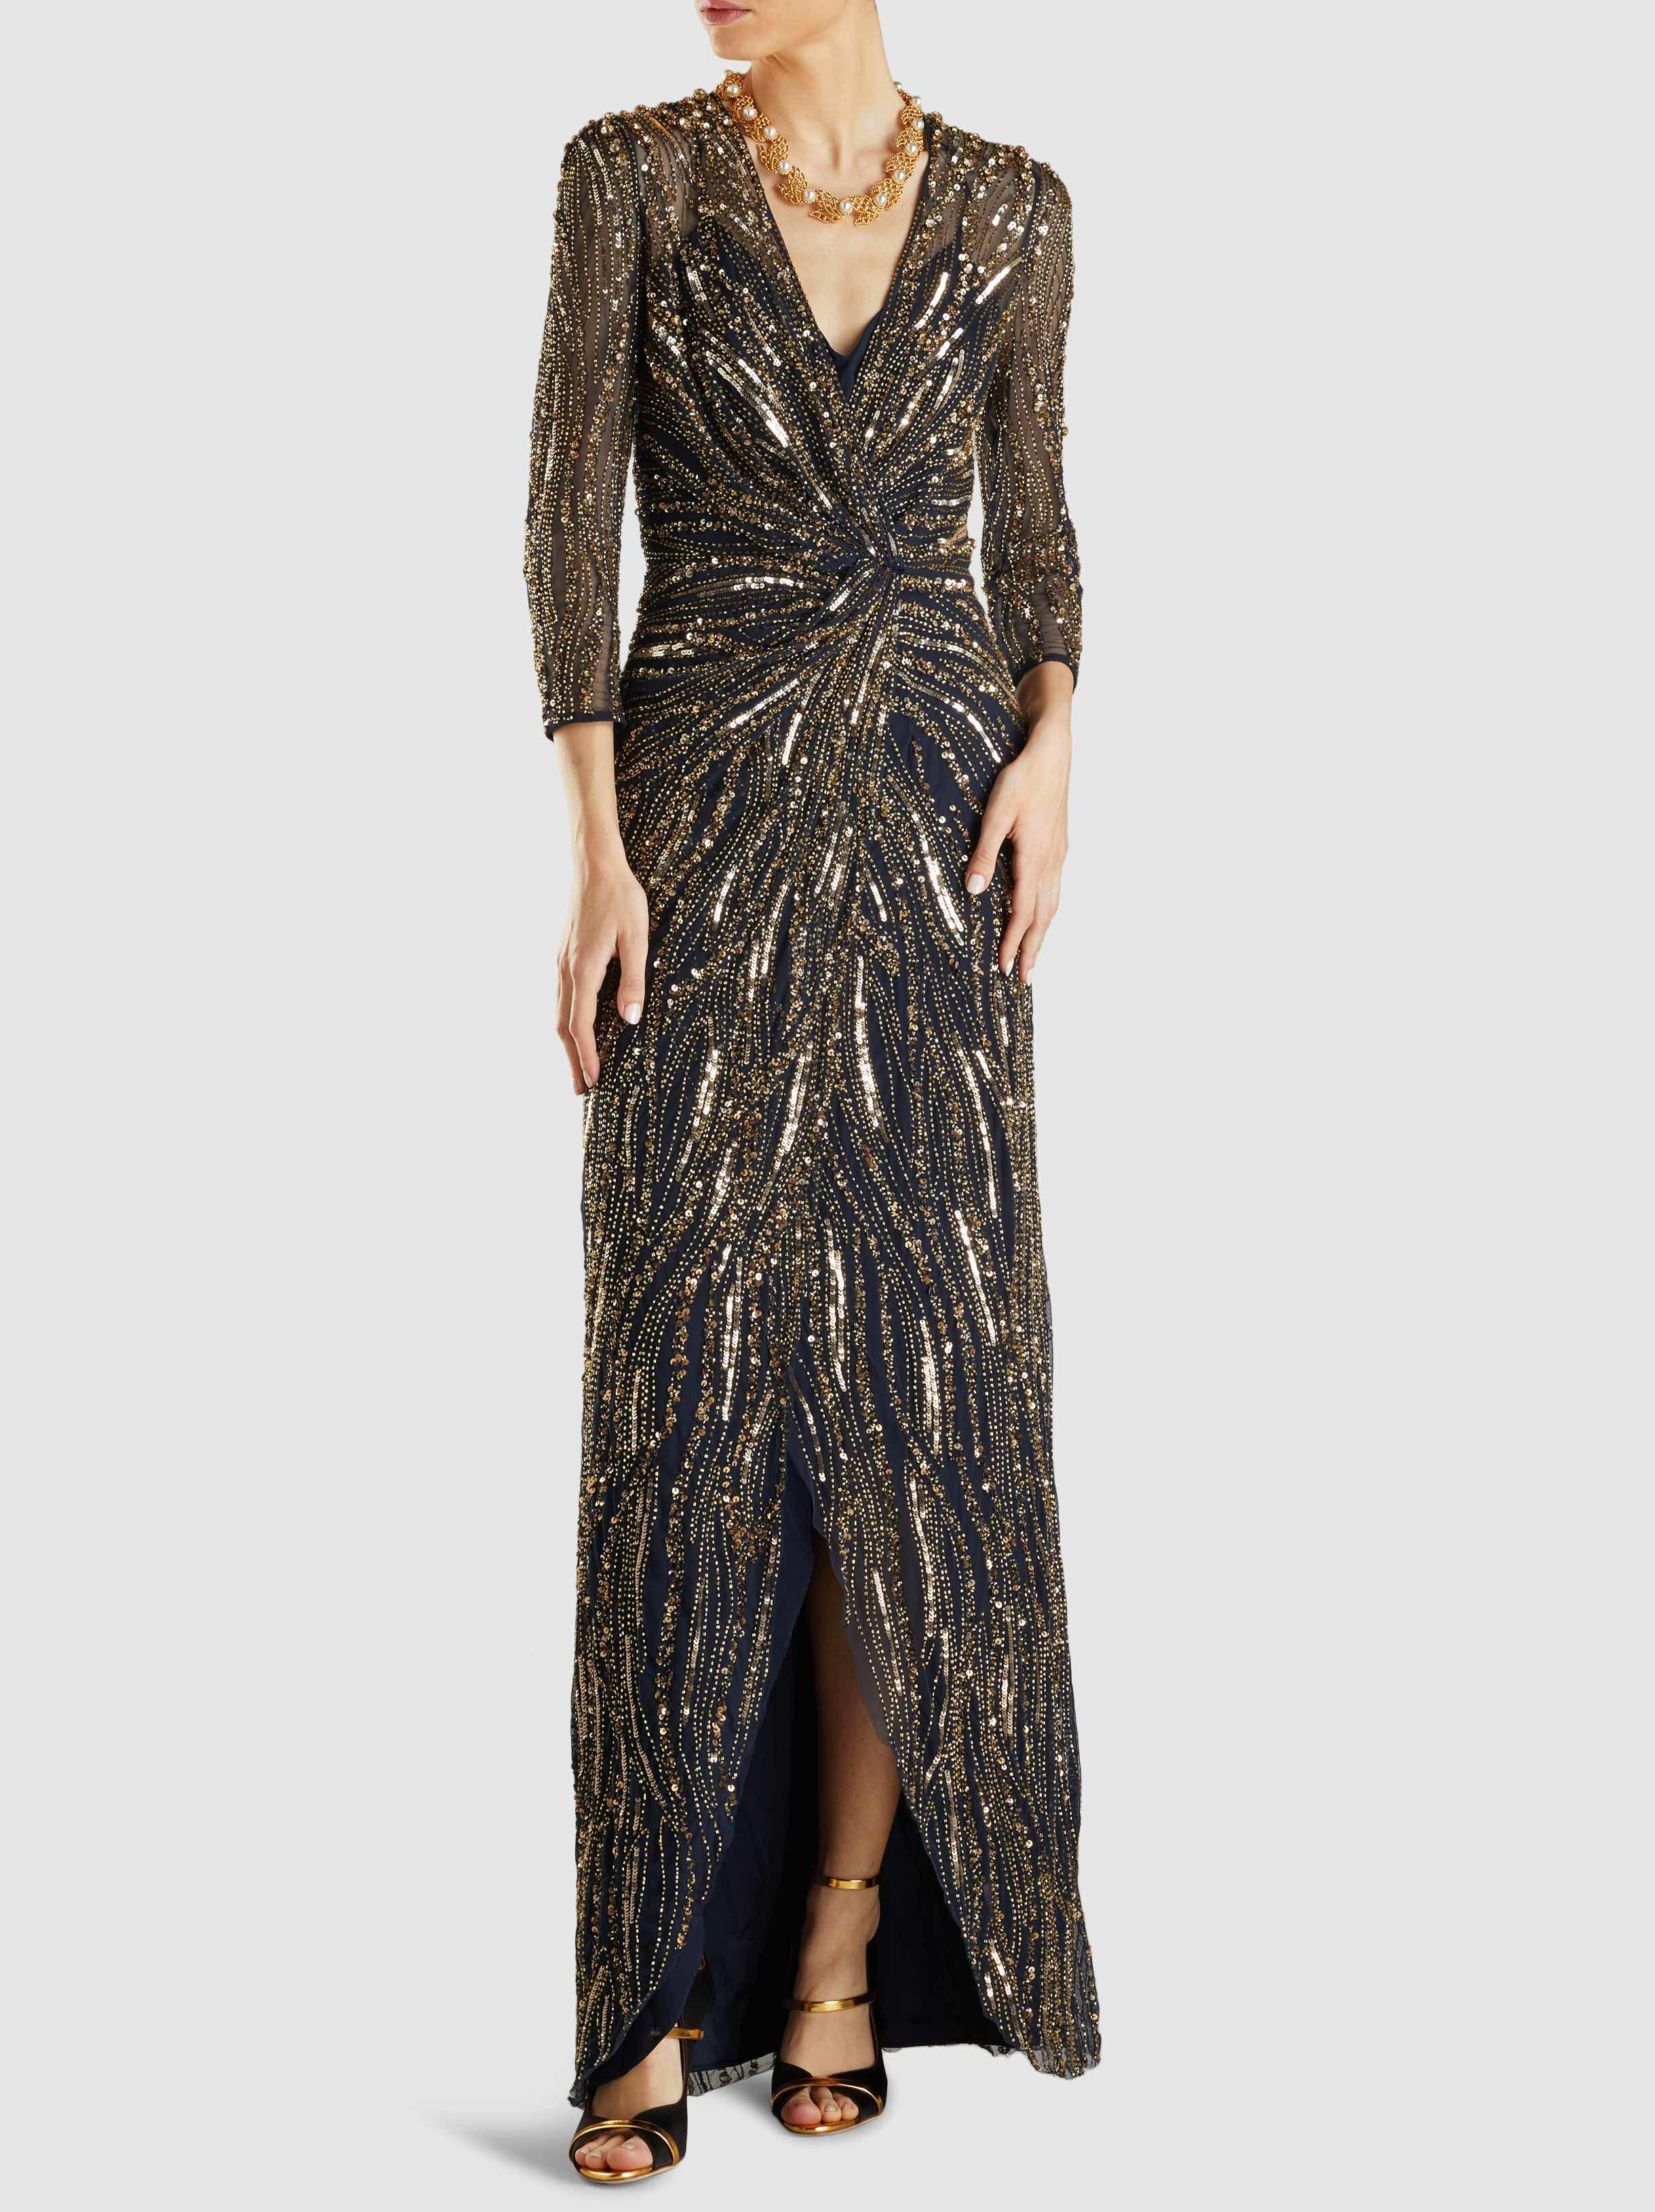 57b2991a753d8 jenny-packham-Gold-Phoenix-Long-Sleeve-Gold-Bead-Twist-Front-Gown.jpeg